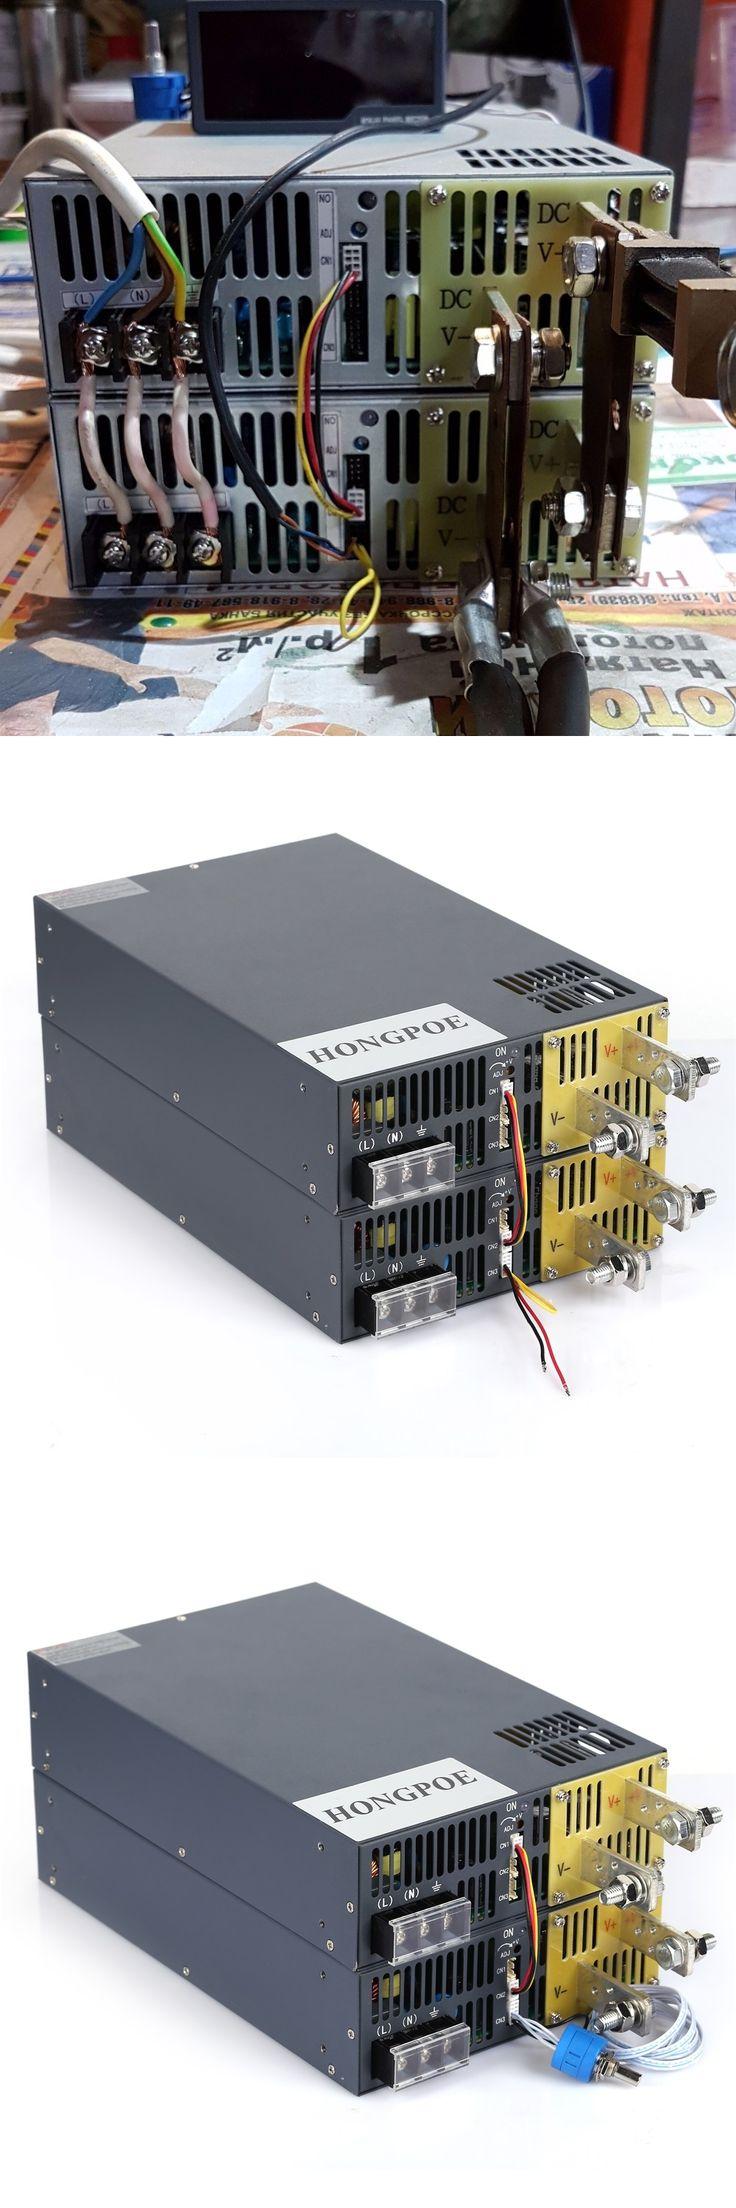 4000W 12V 333A DC 0-12v power supply  12V 333A AC-DC High-Power PSU 0-5V analog signal control SE-4000-12